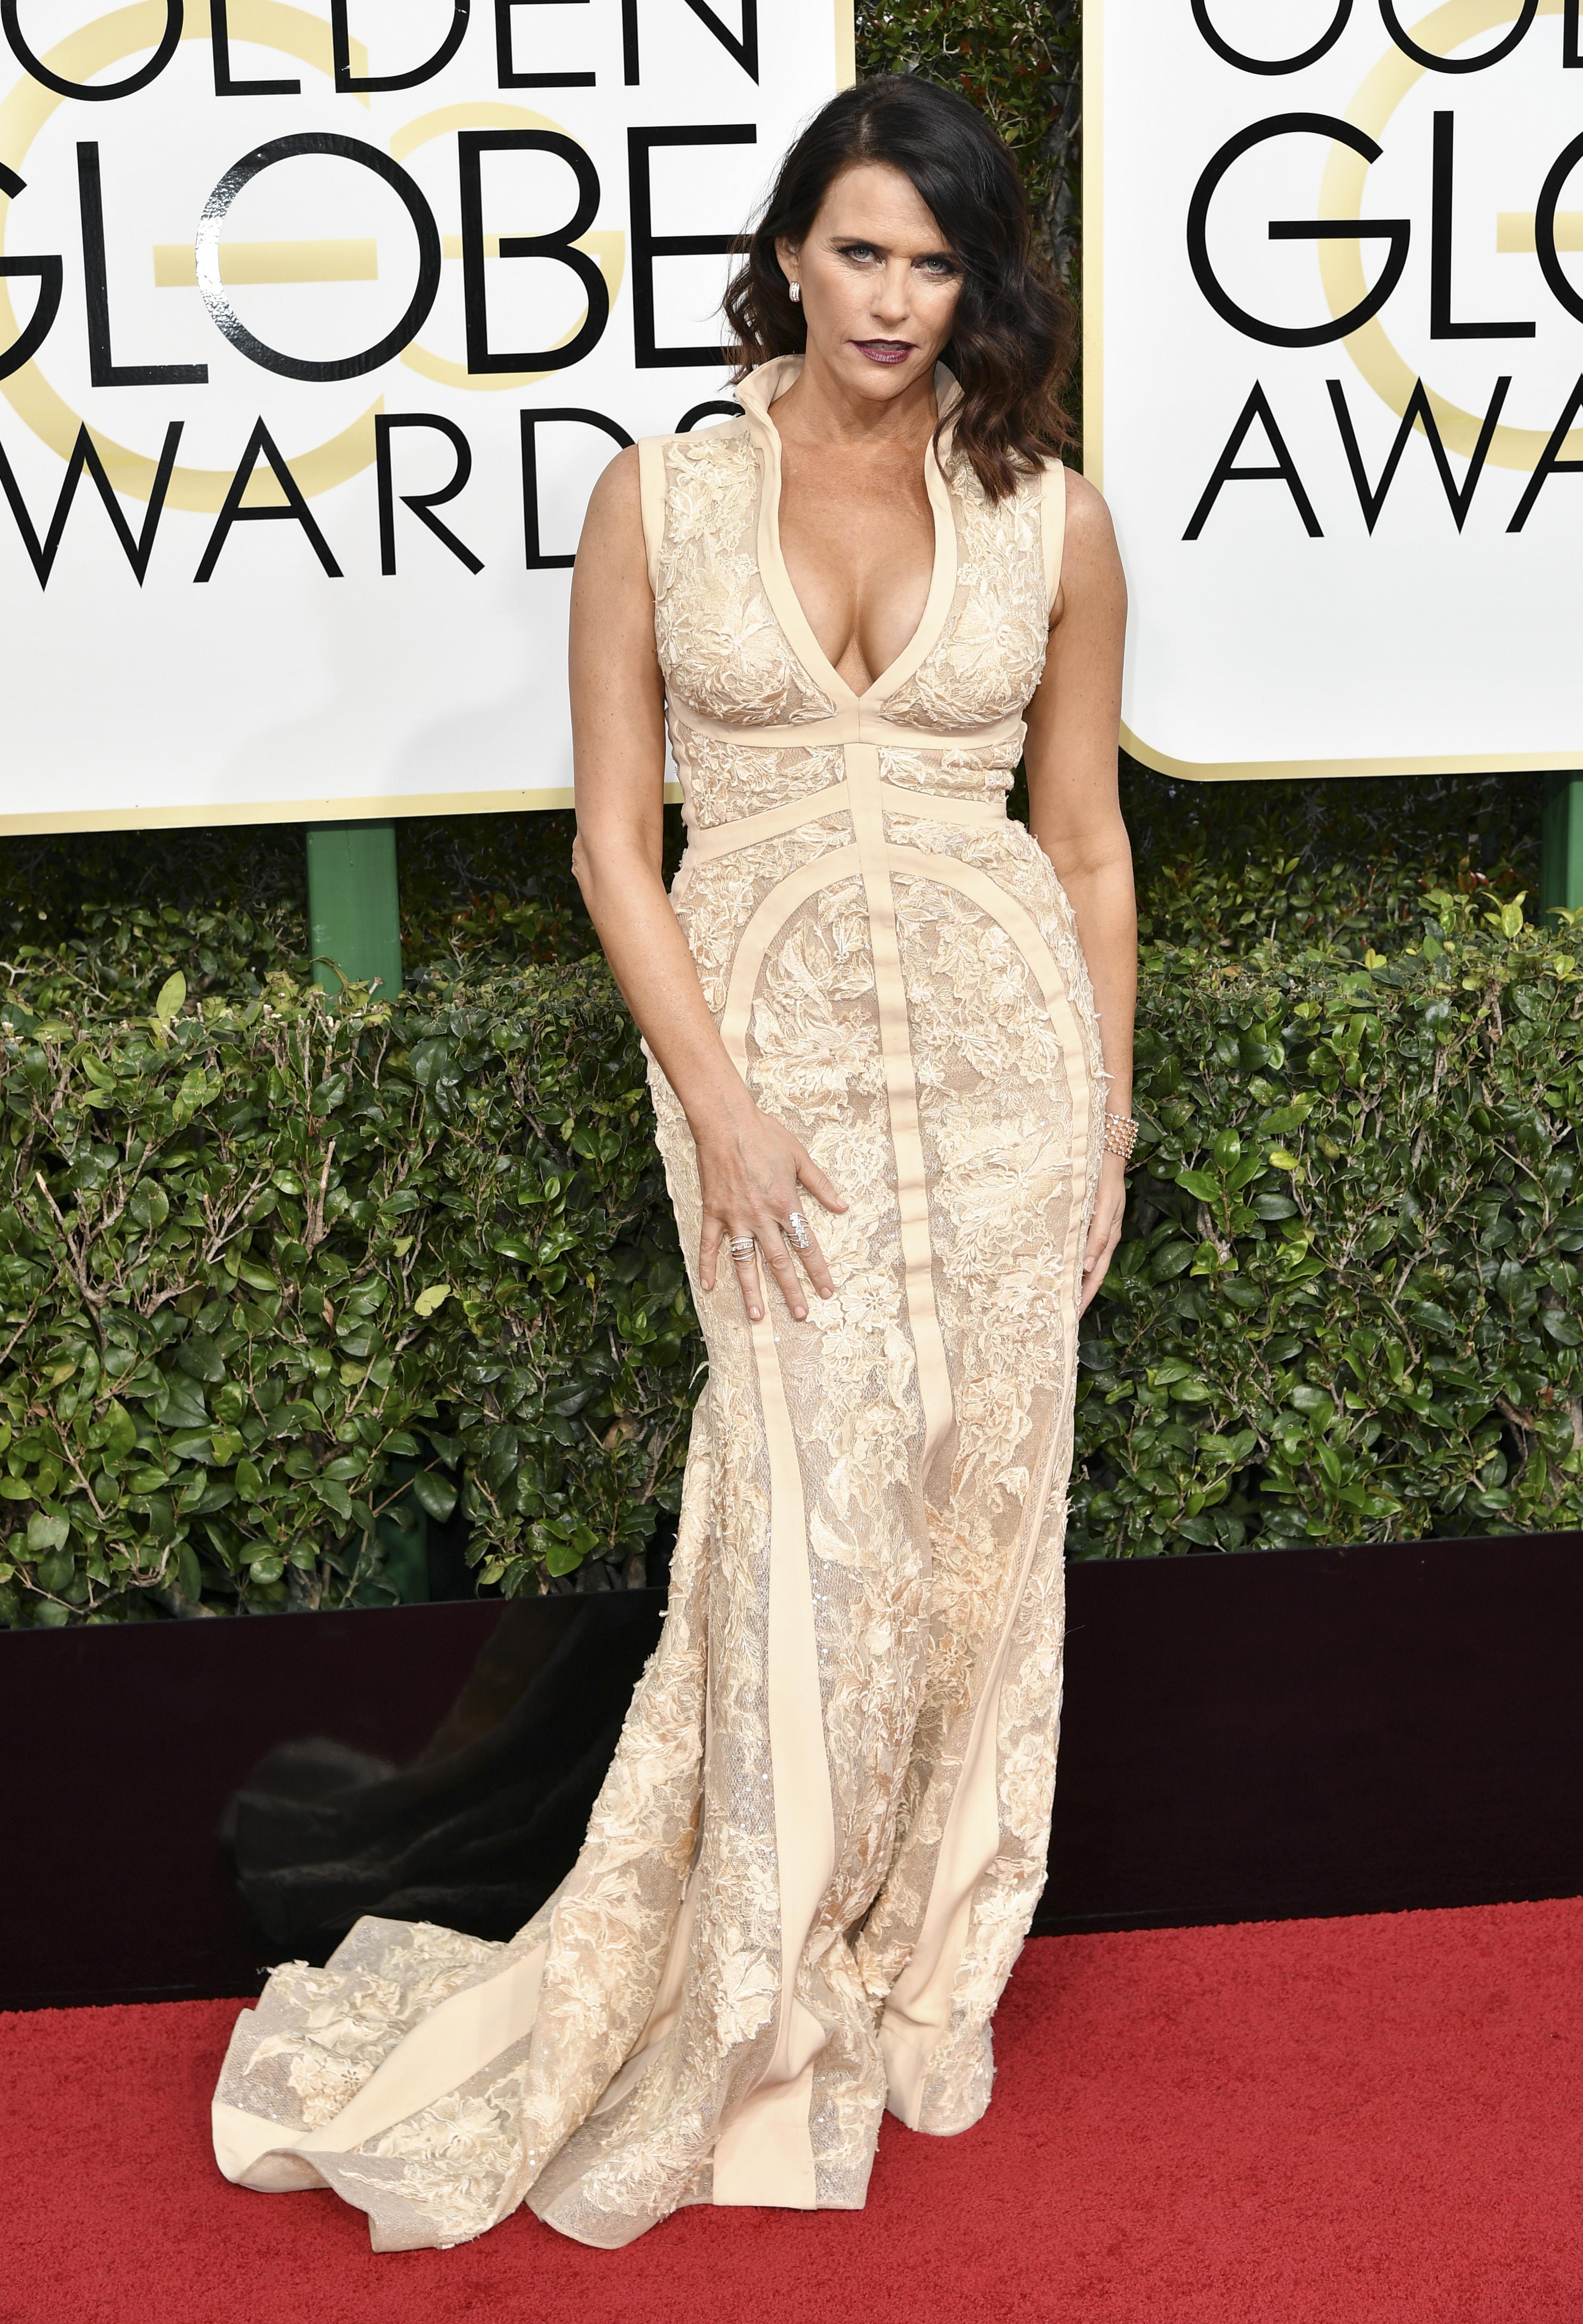 Amy Landecker, Golden Globes. Mandatory Credit: Photo by Rob Latour/REX/Shutterstock